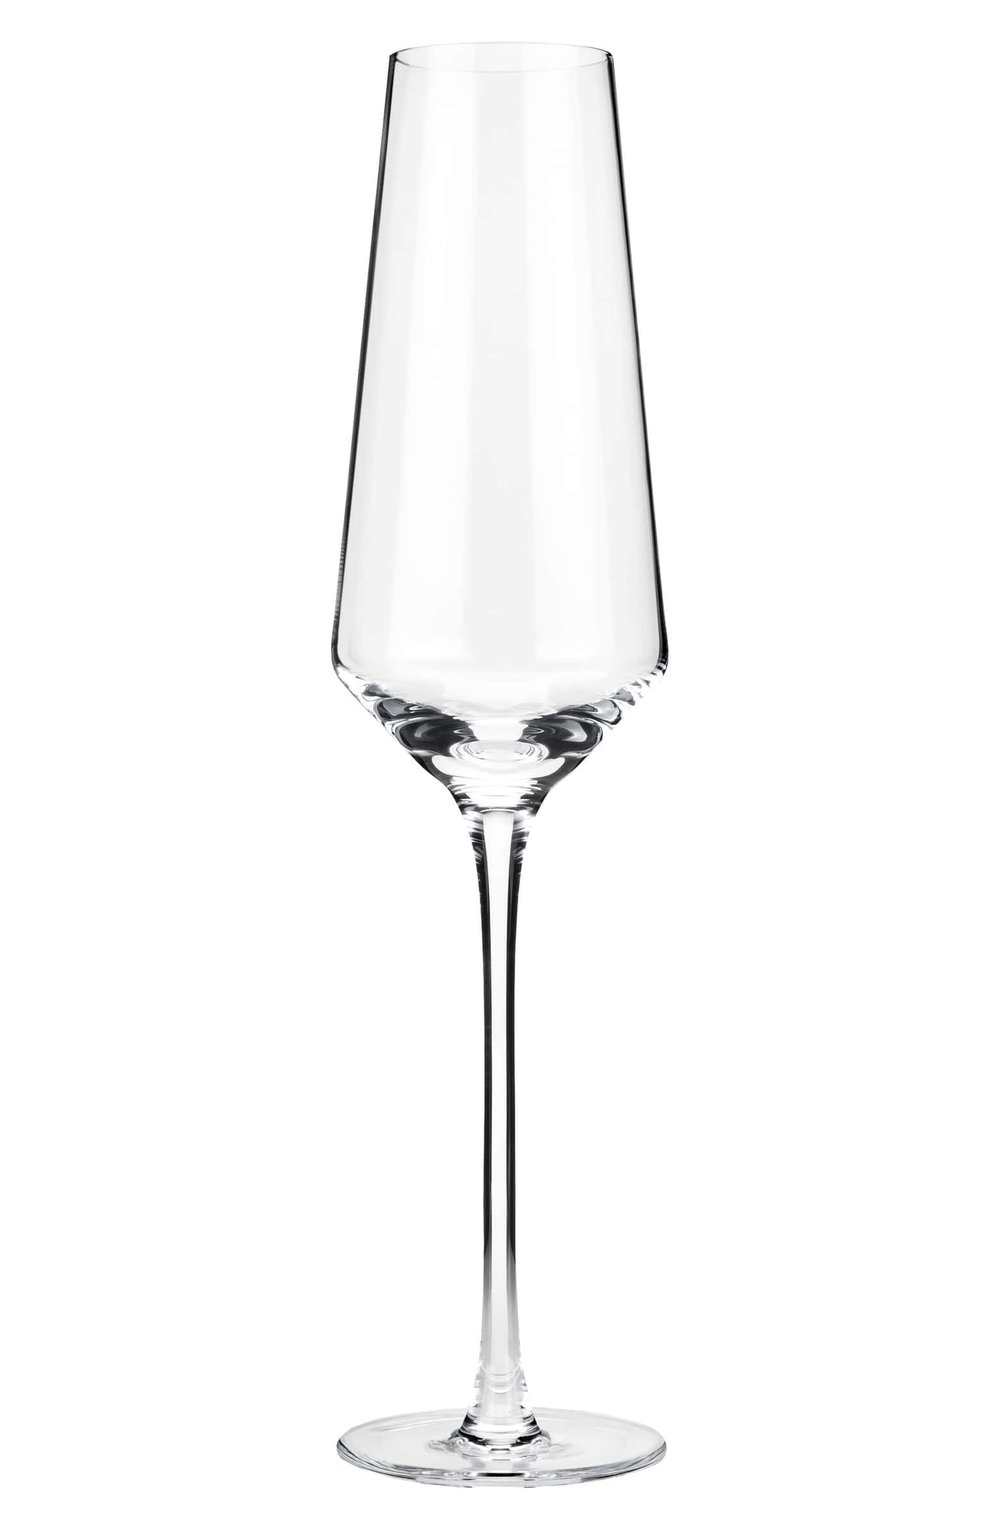 Viski Raye Set of 2 Crystal Champagne Flutes - What a steal! 2 gorgeous crystal champagne flutes for only $25.